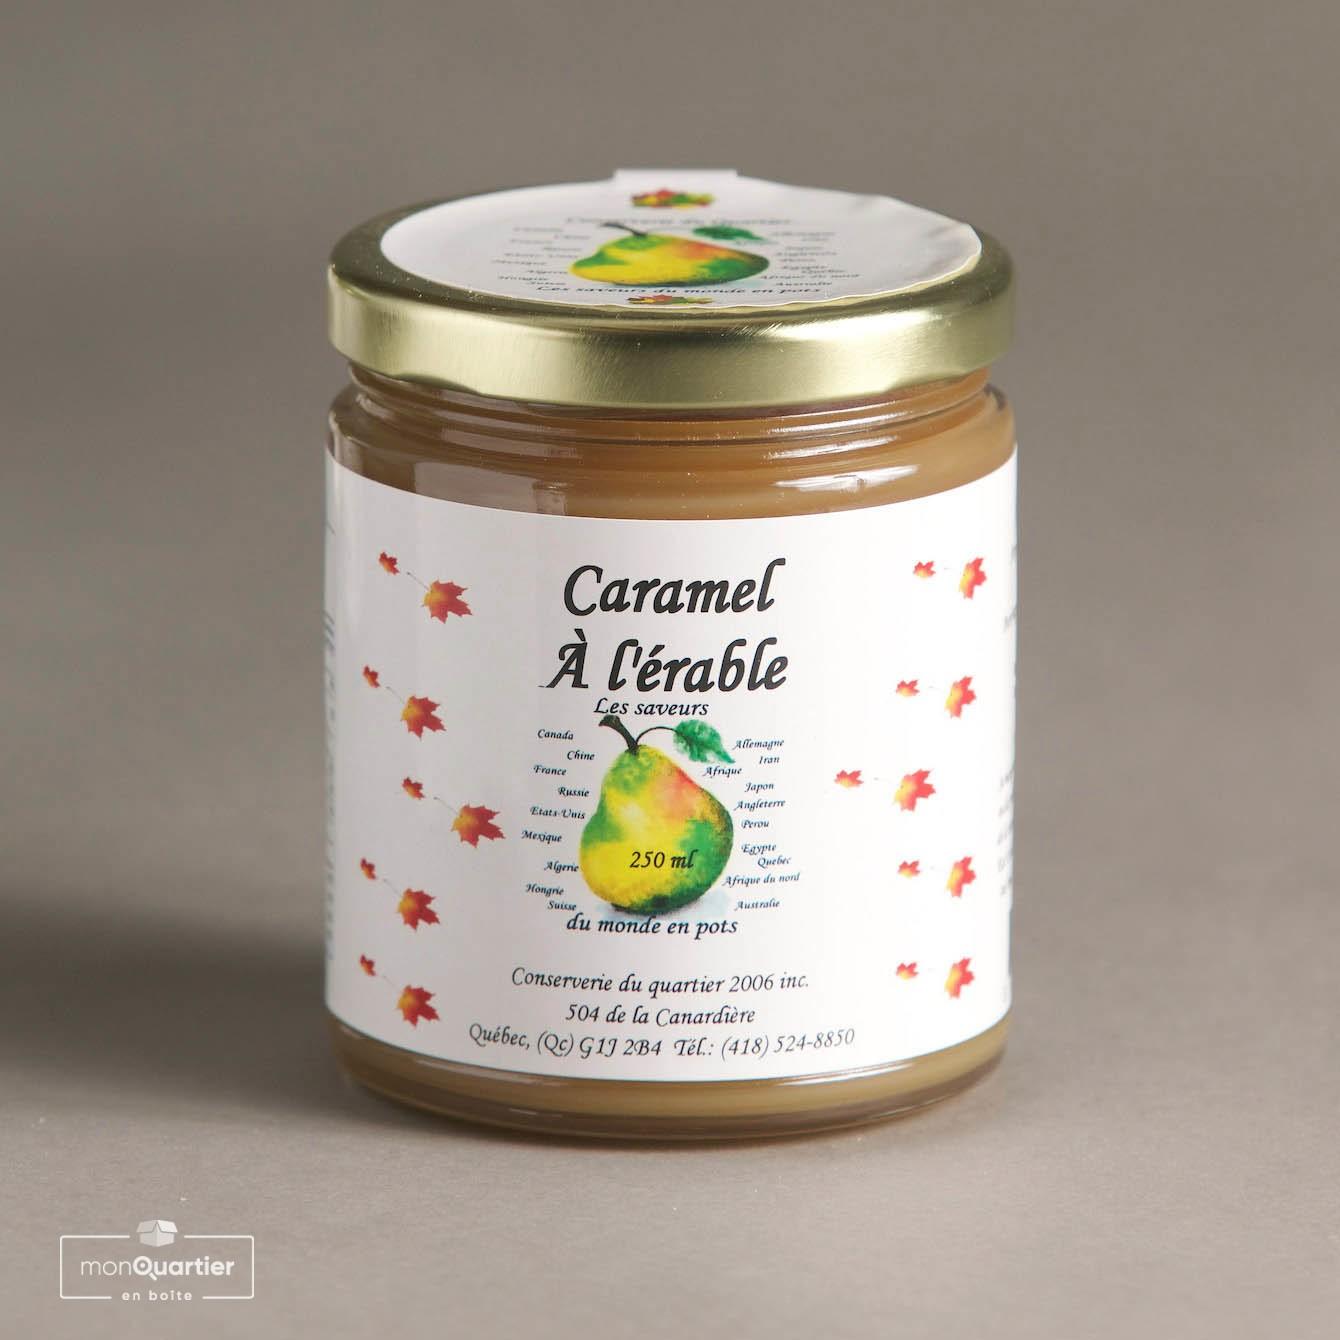 conserverie-caramel-erable